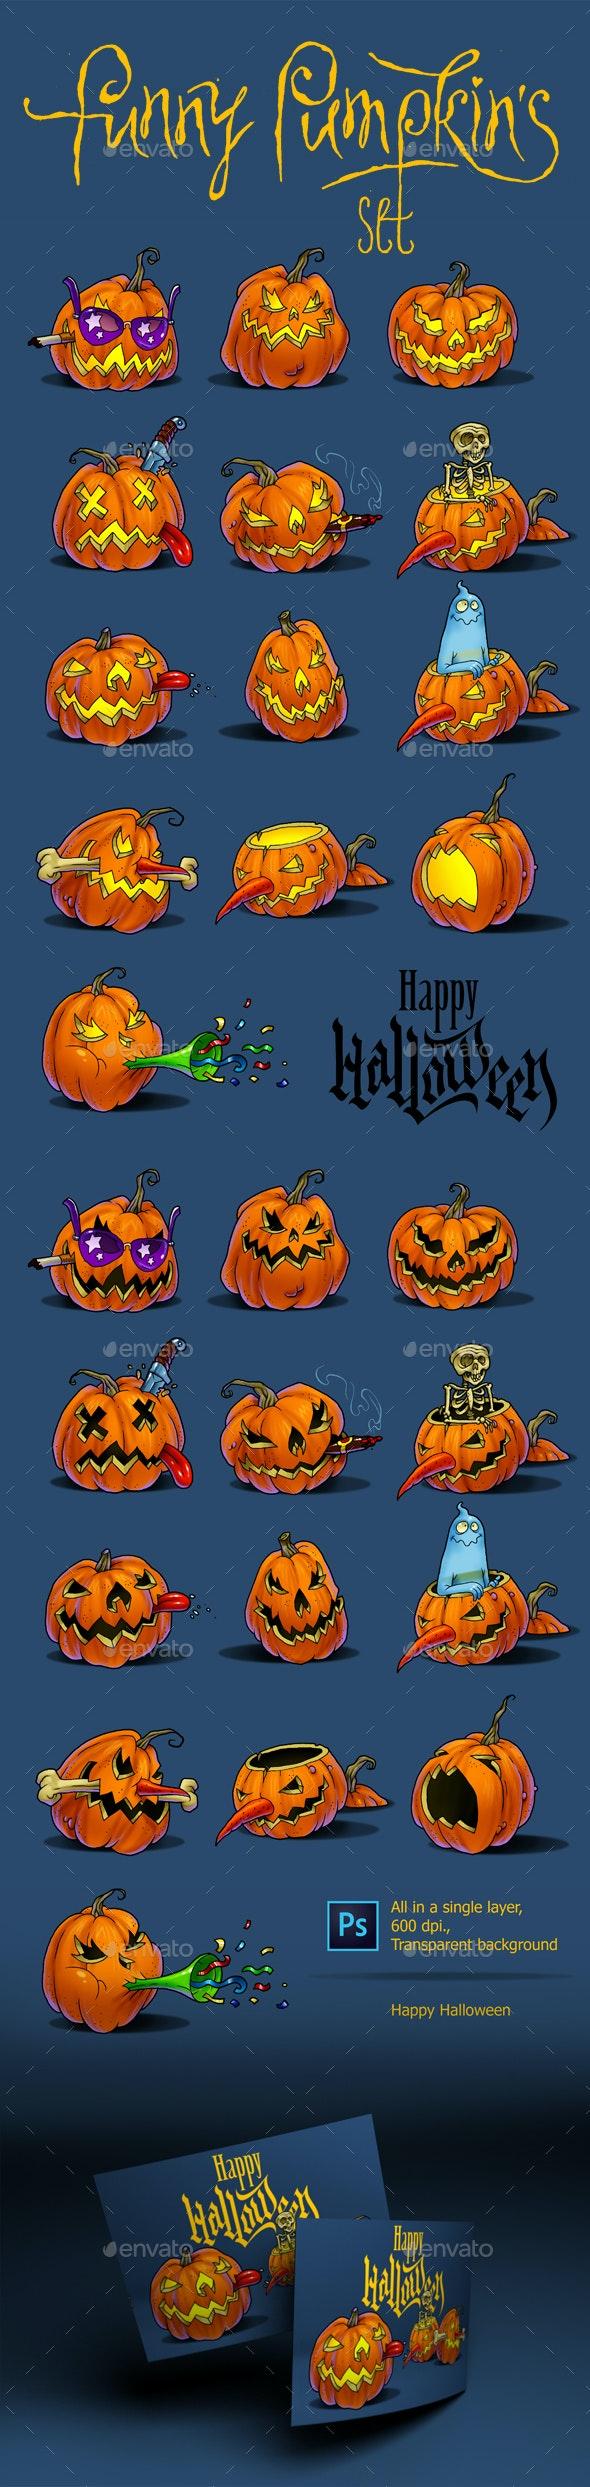 Funny Pumpkins By Serjio7777 Graphicriver